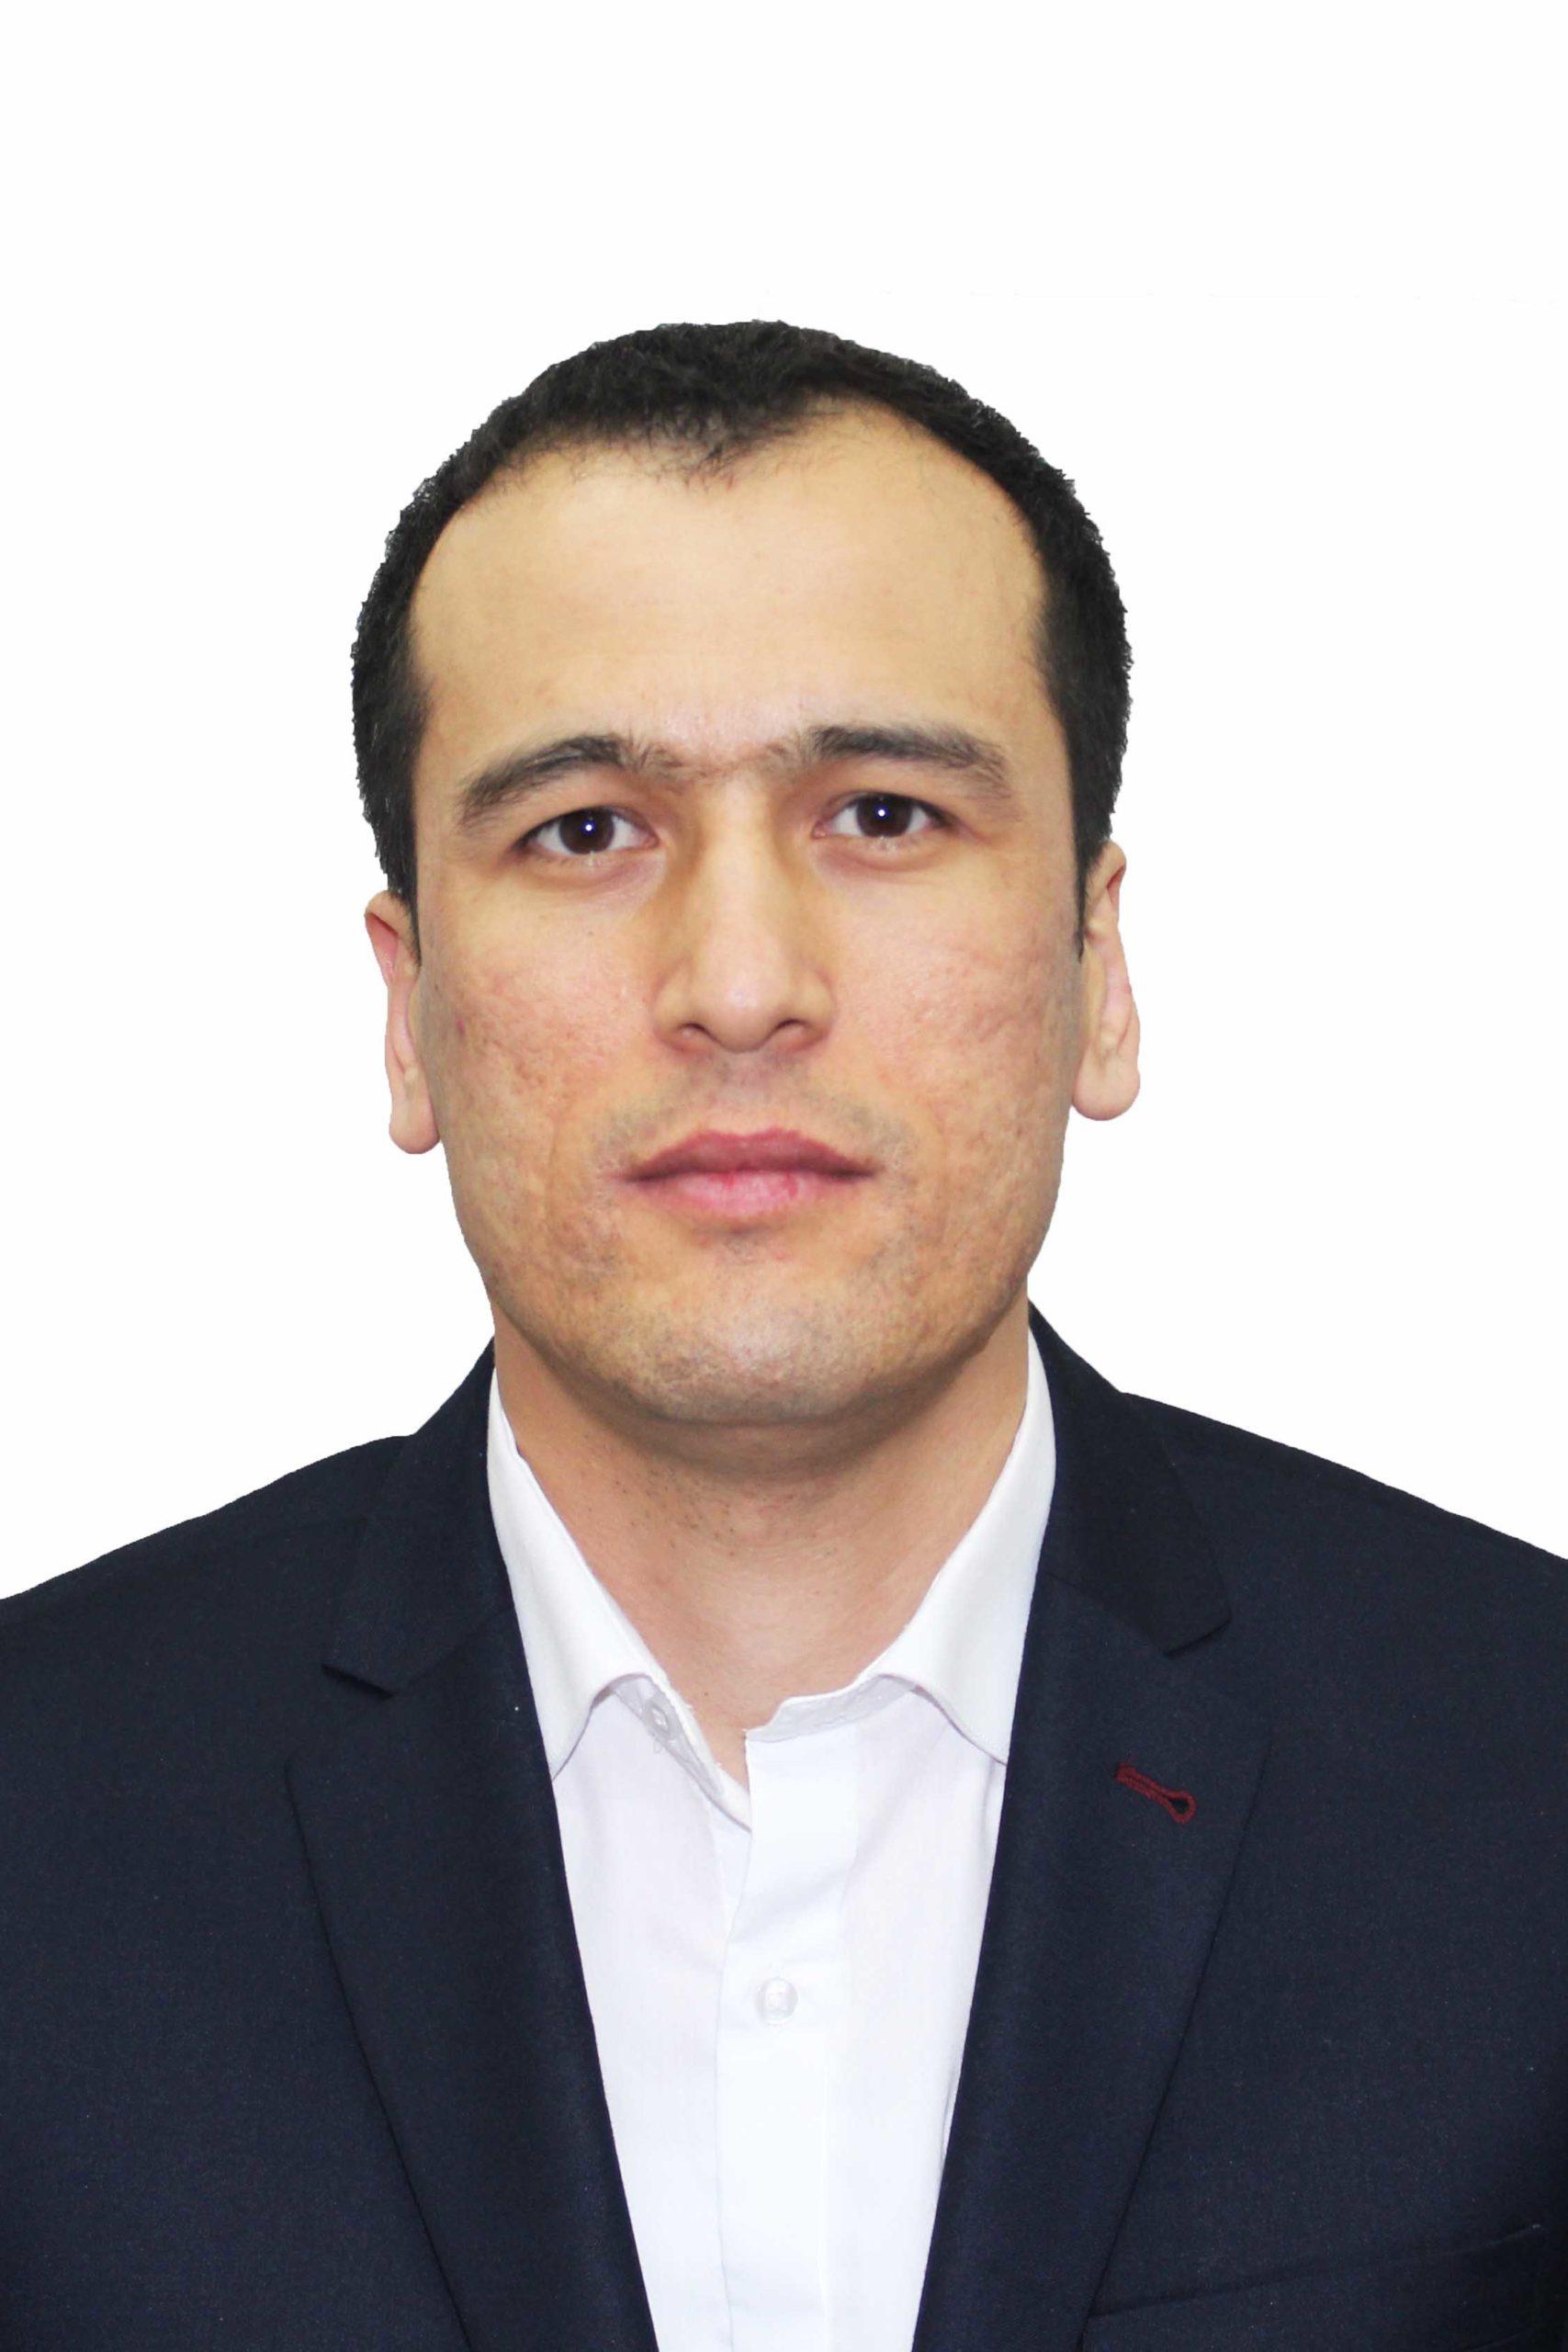 Муркамилов Илхом Торобекович